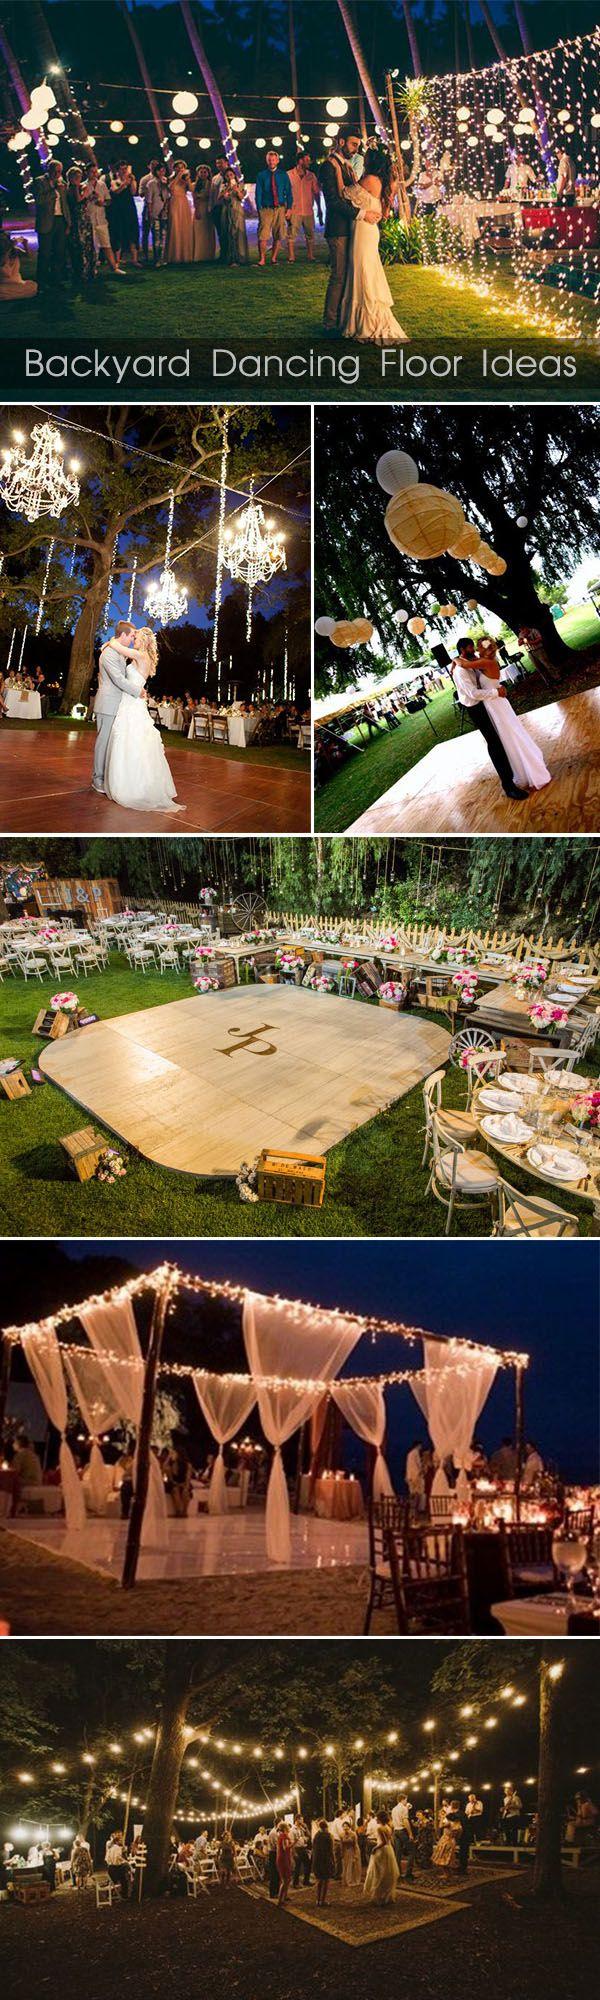 30 Sweet Ideas For Intimate Backyard Outdoor Weddings Elegantweddinginvites Com Blog Dance Floor Wedding Wedding Backyard Reception Backyard Wedding Decorations